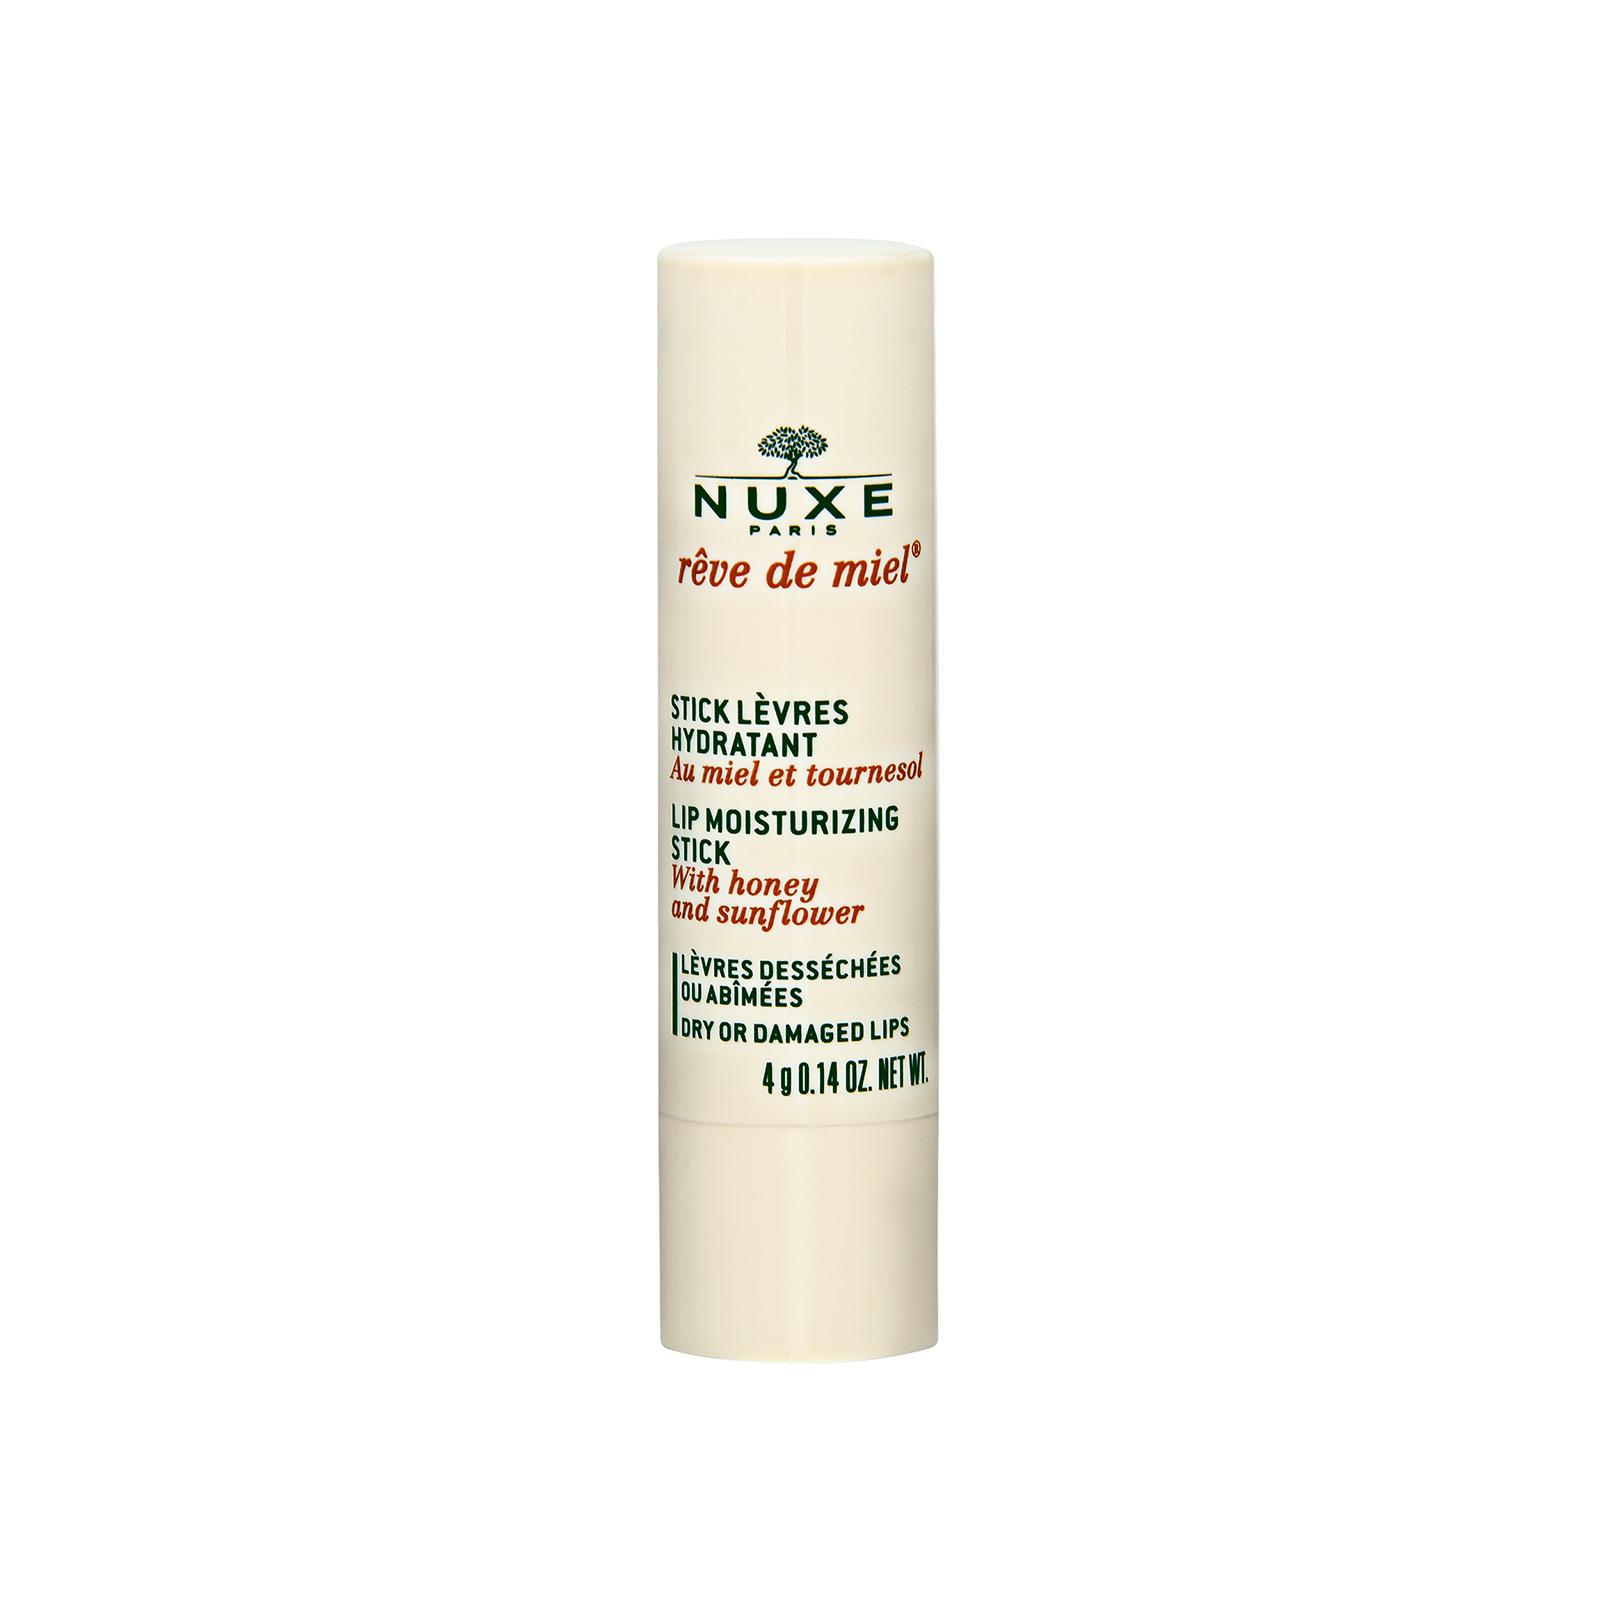 NUXE Rêve de Miel  Lip Moisturizing Stick (Dry or Chapped Lips) 0.14oz, 4g